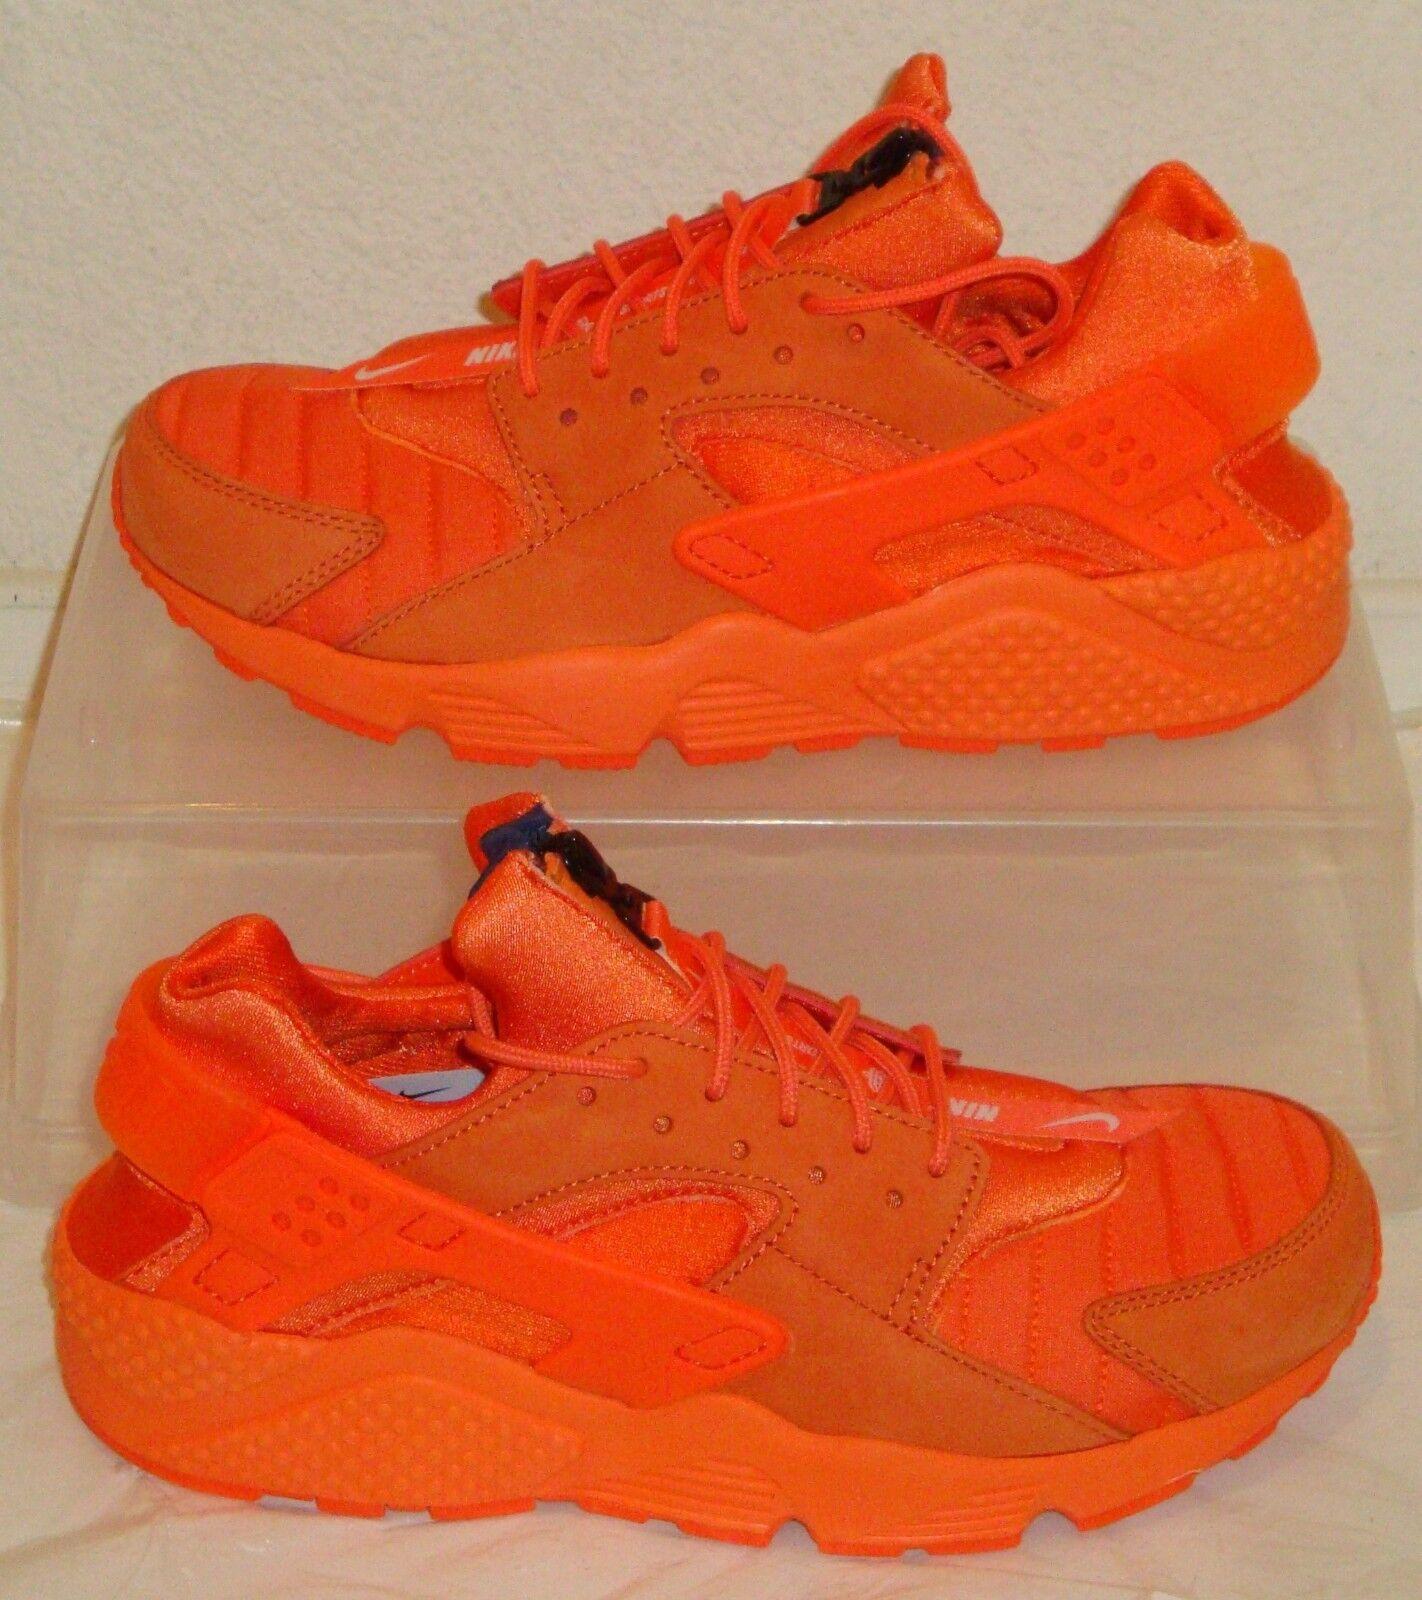 Nike Shoes Air Huarache Run QS Orange Blaze Navy Mens US Size 8